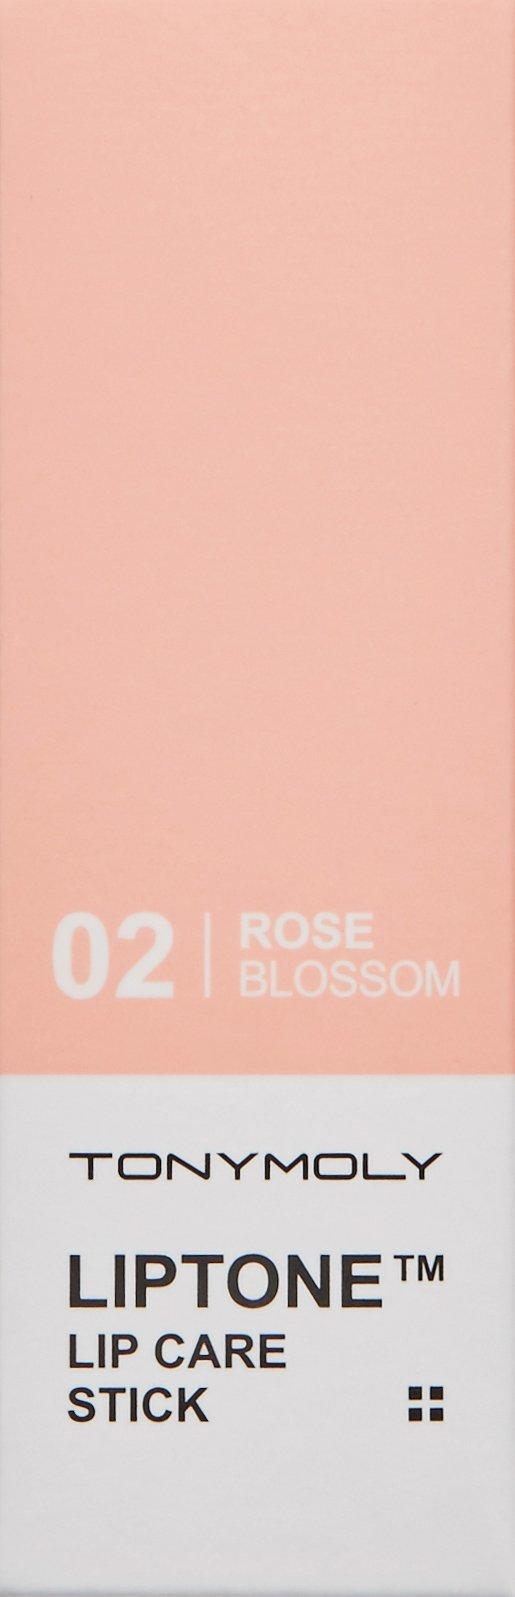 TONYMOLY Liptone Rose Blossom Lip Care Stick by TONYMOLY (Image #2)